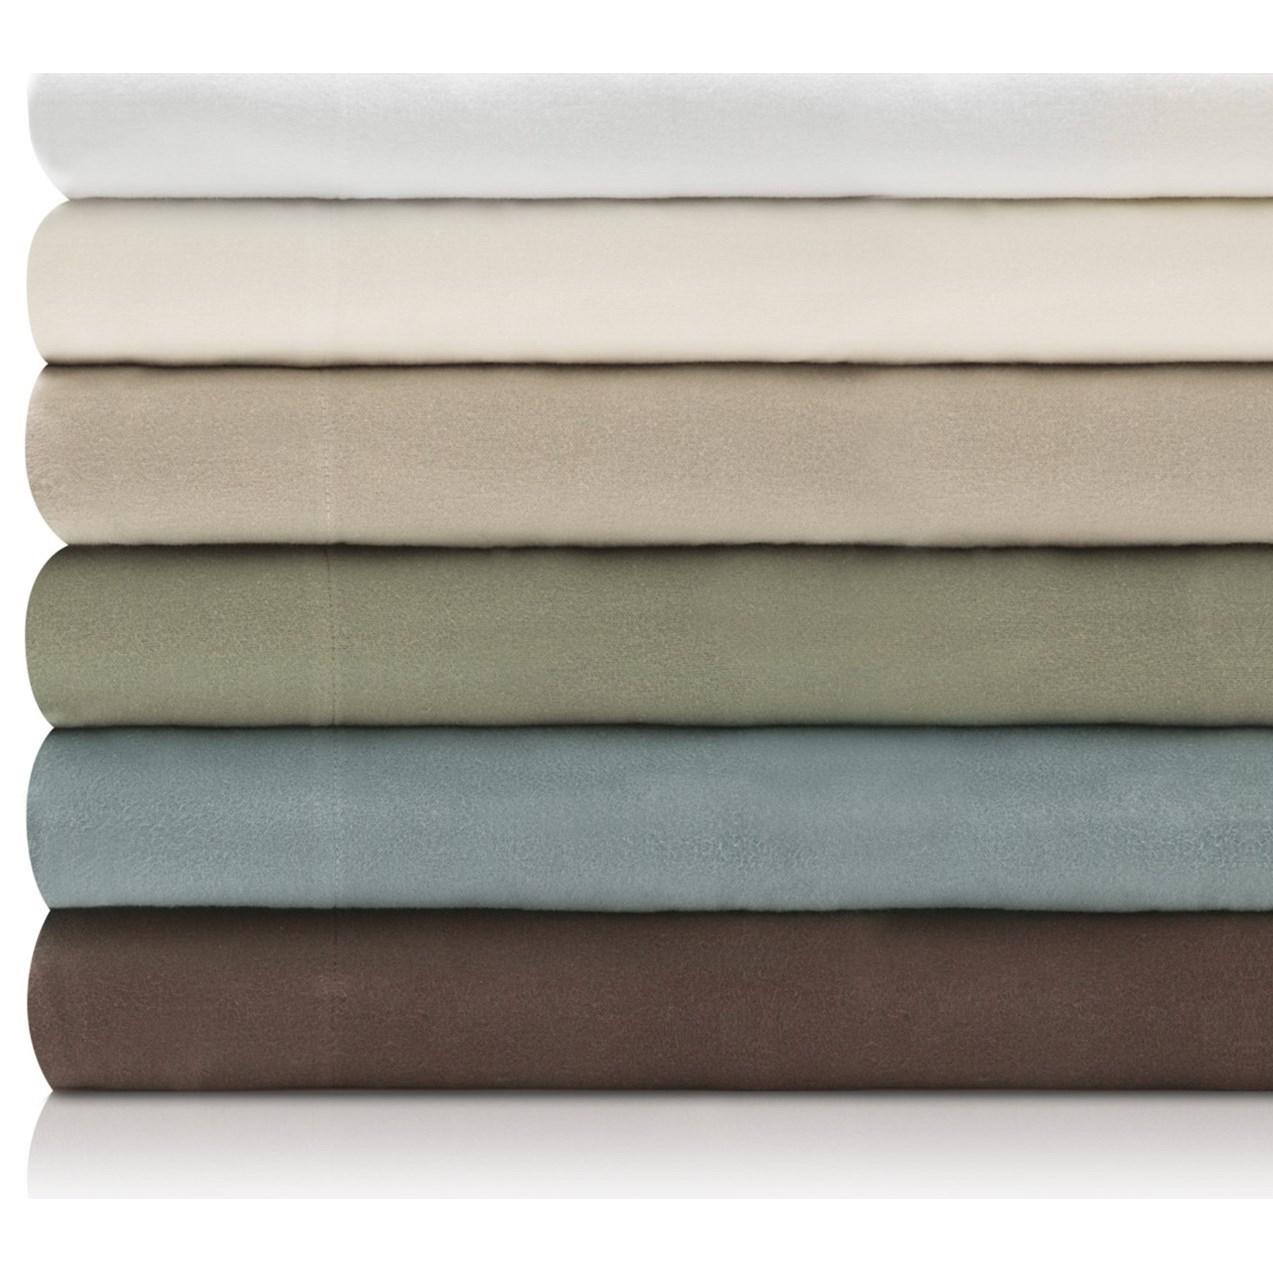 Malouf Portuguese Flannel Queen Woven™ Portuguese Flannel Pillowcases  - Item Number: WO19QQWHFC